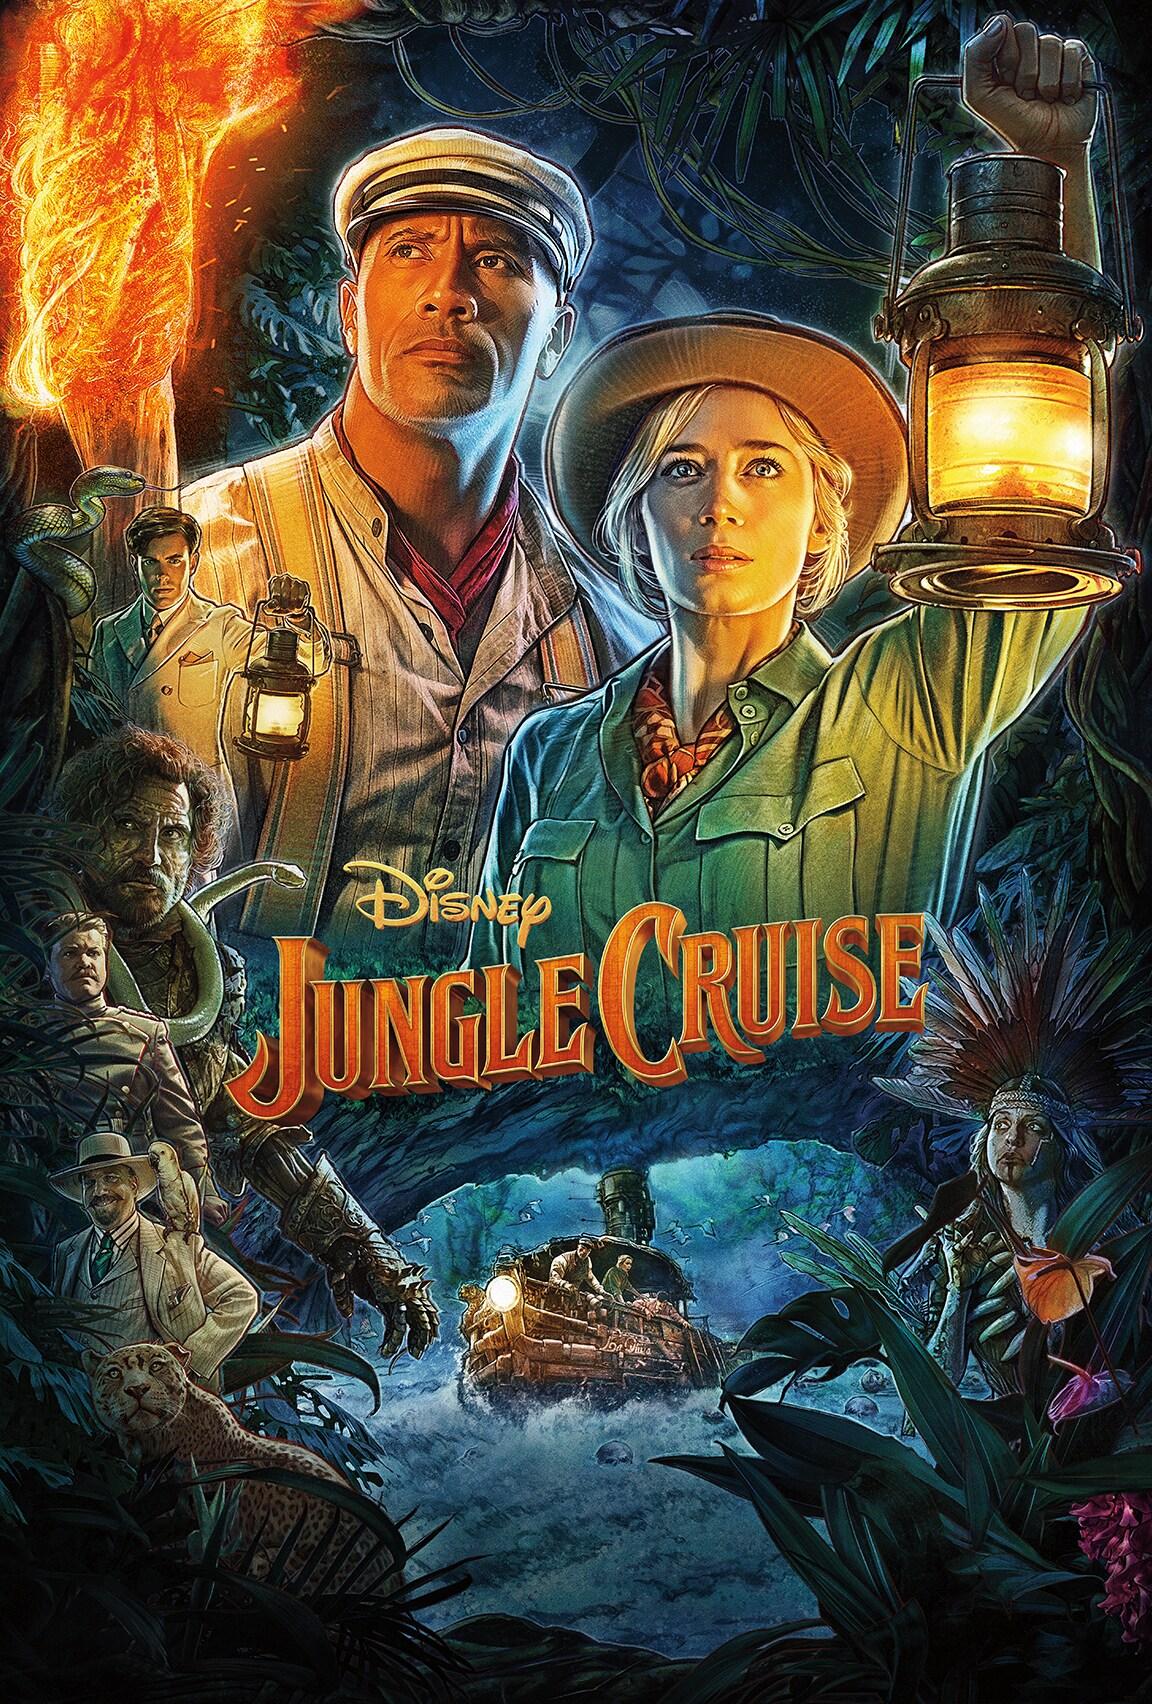 Jungle Cruise on Disney Plus